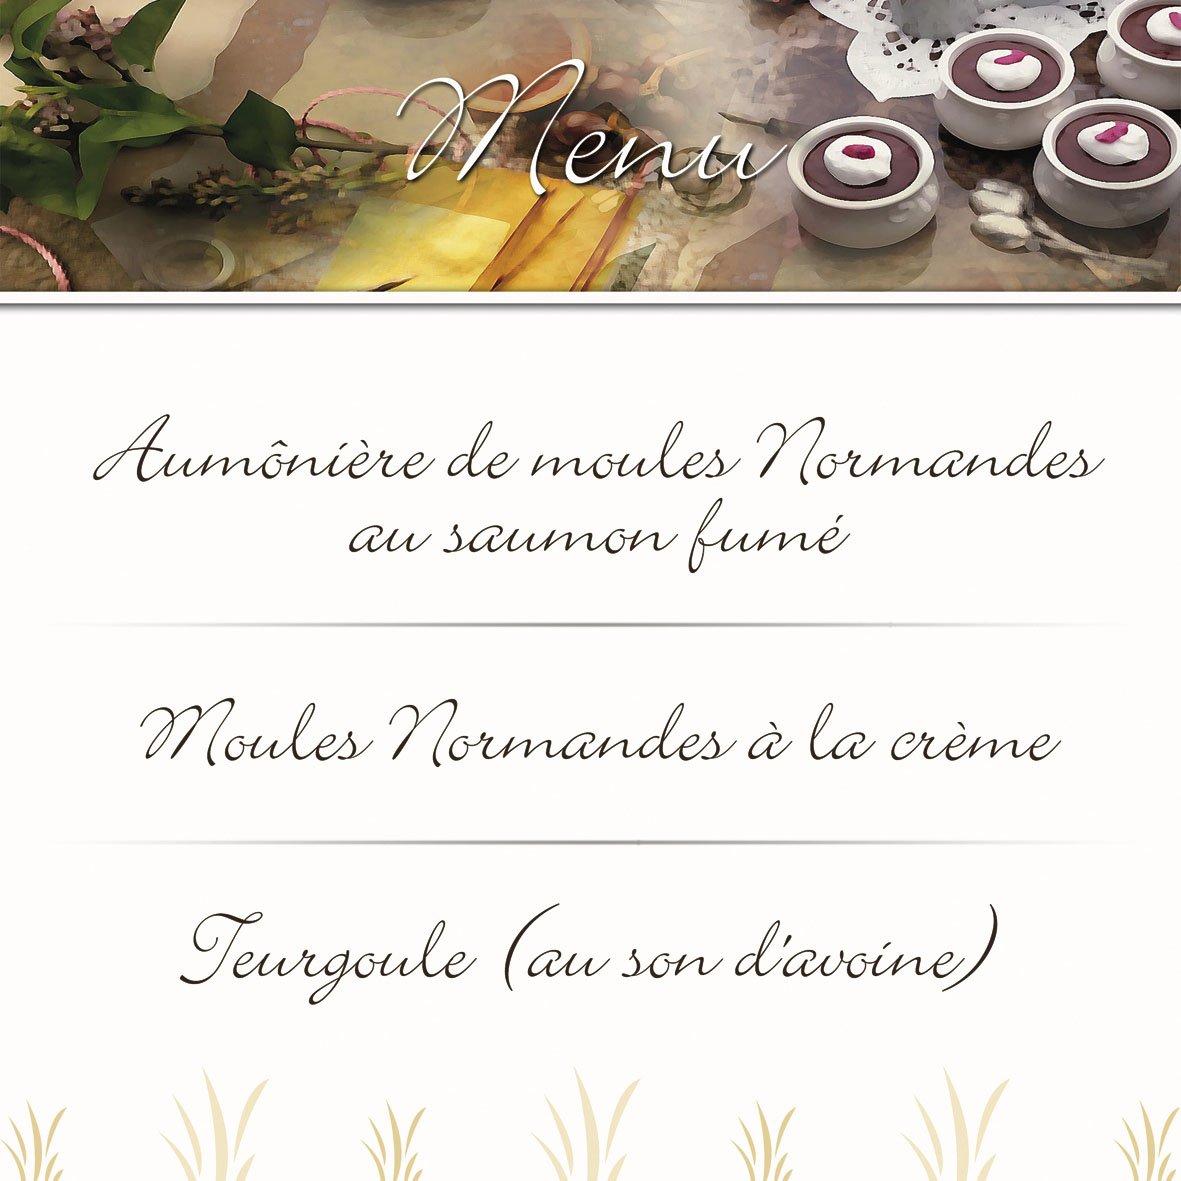 menunormand2.jpg